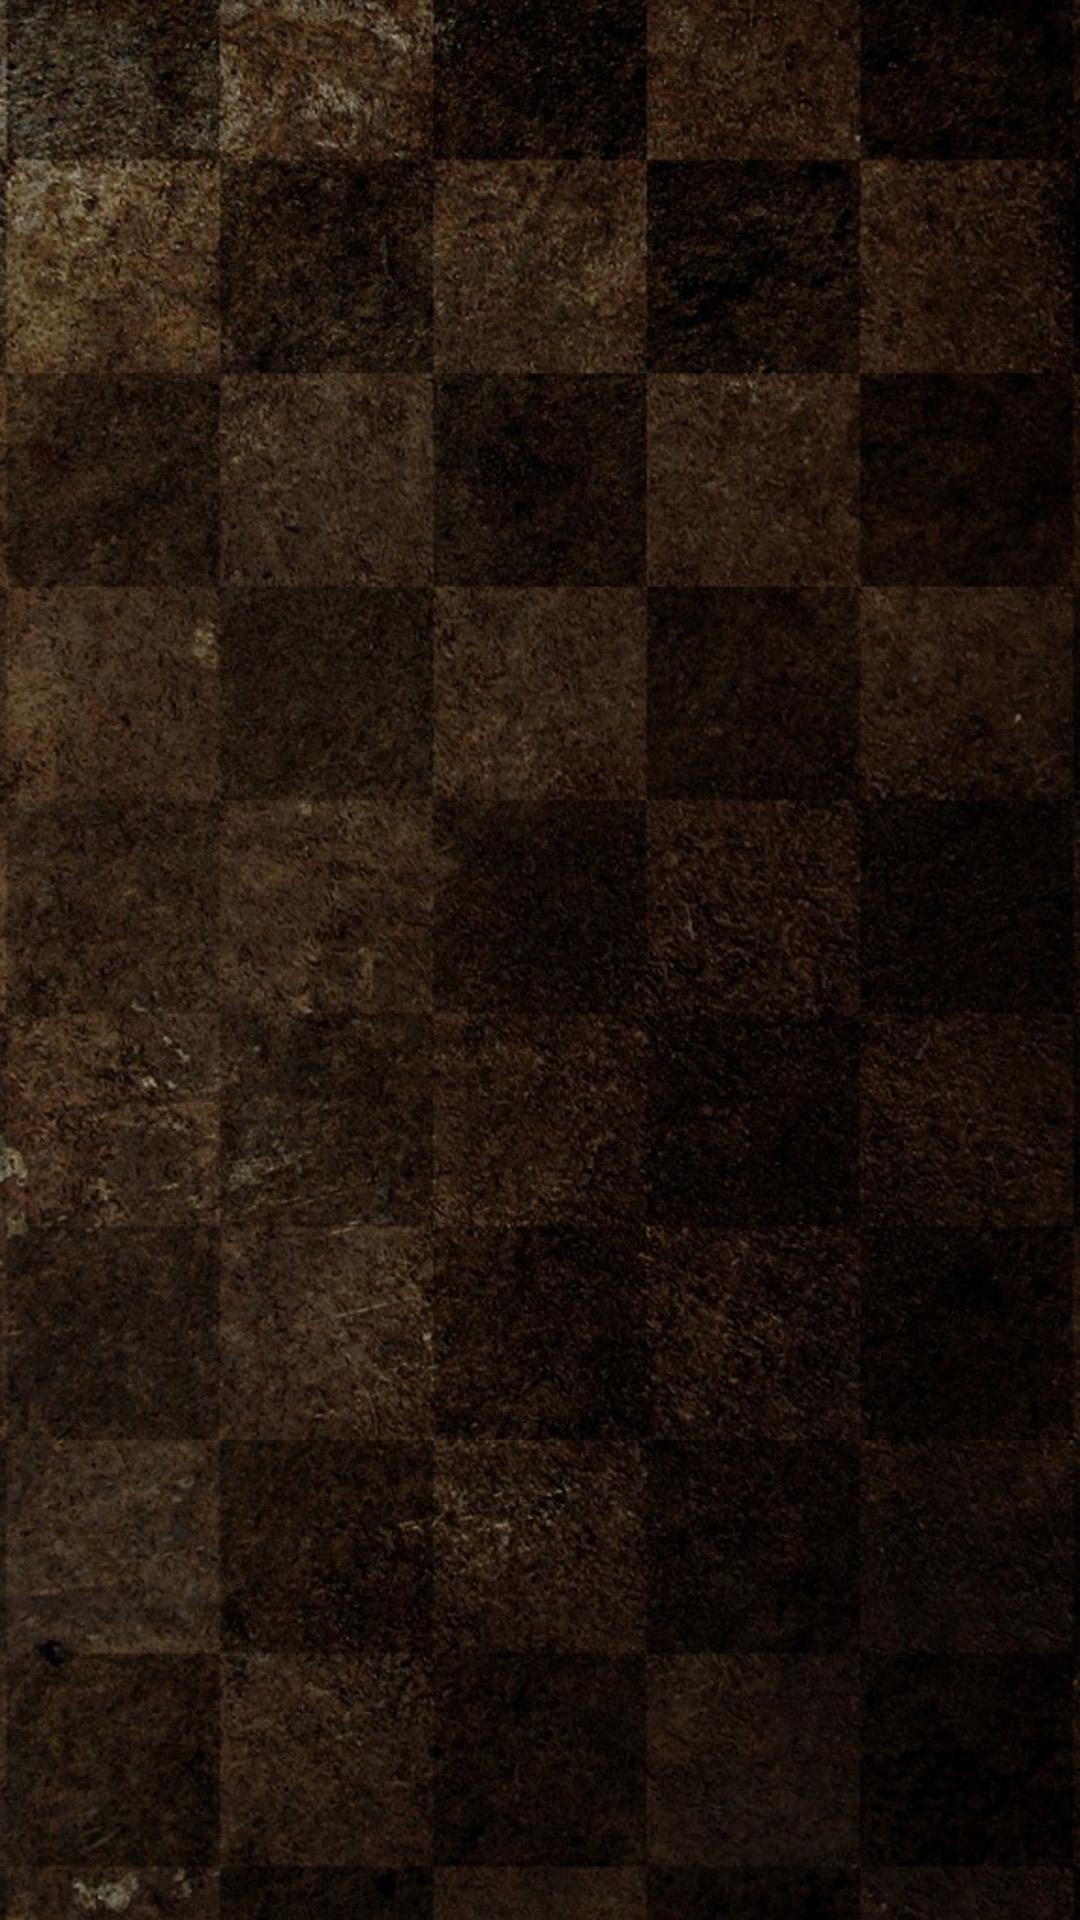 Top Wallpaper High Quality Texture - 5HizSp  HD_487425.jpg